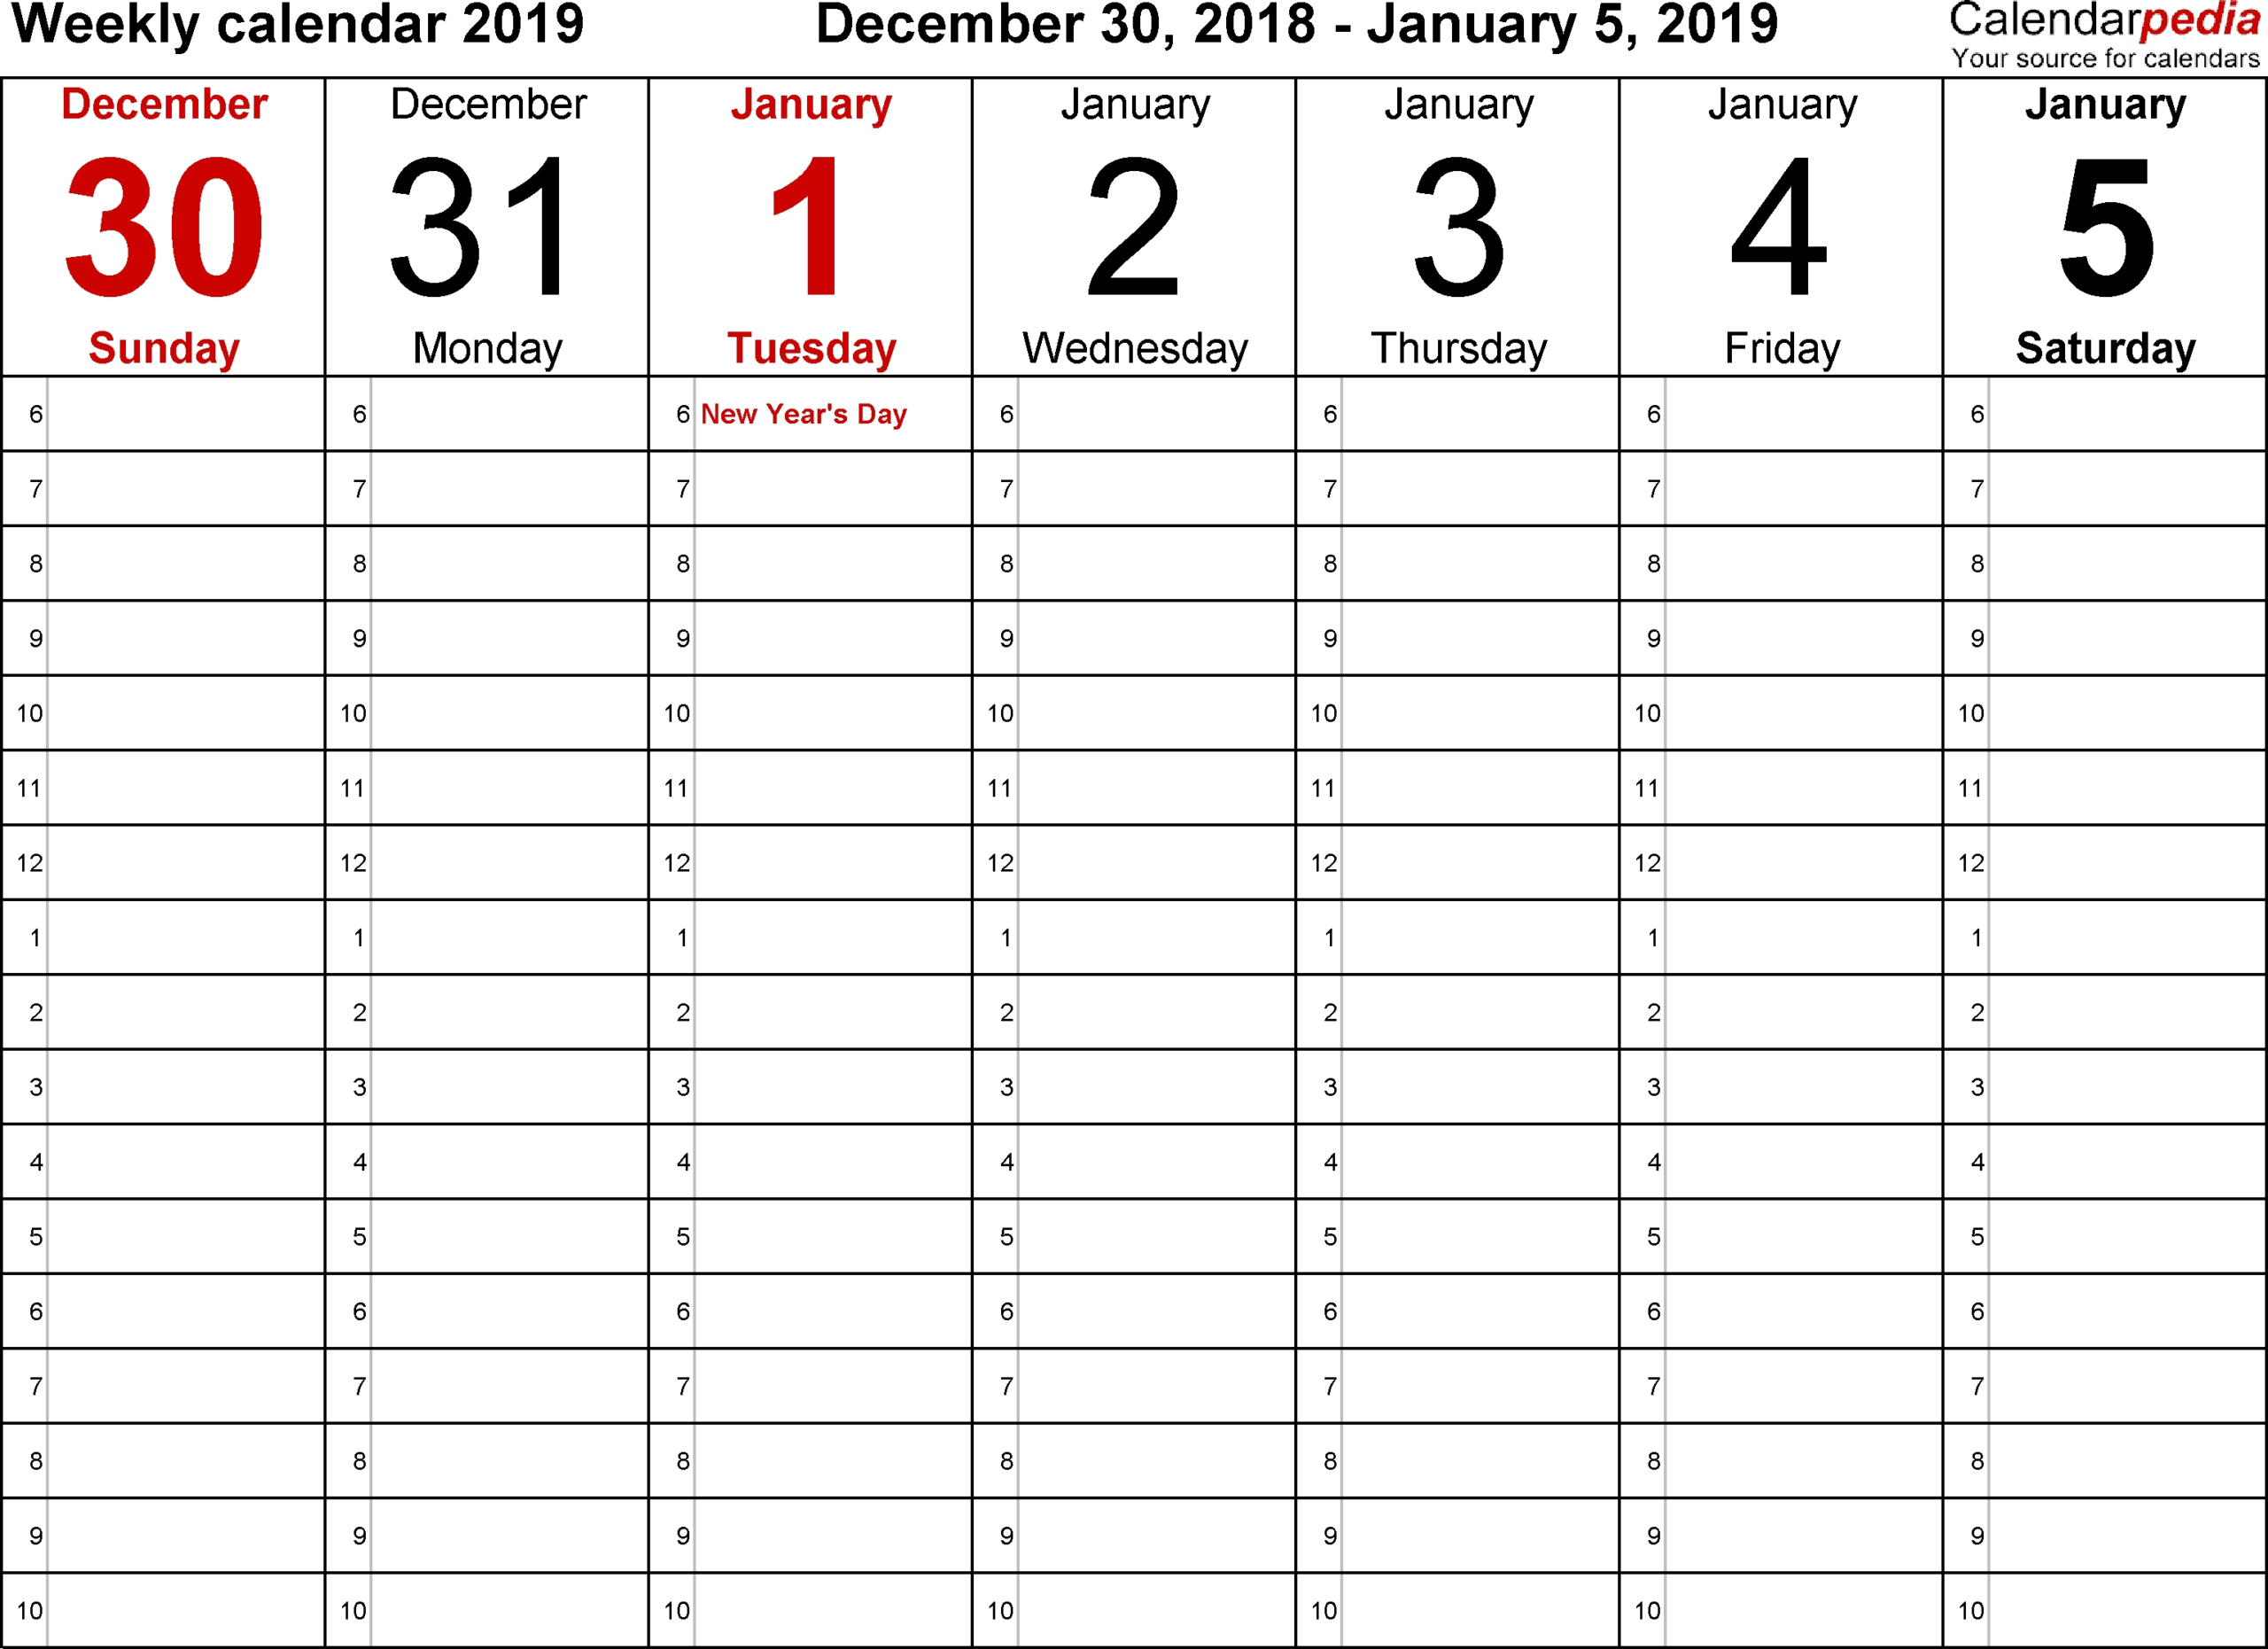 5 Day Week Blank Calendar With Time Slots Printable  Calendar Inspiration Design for 5 Day Calendar Template